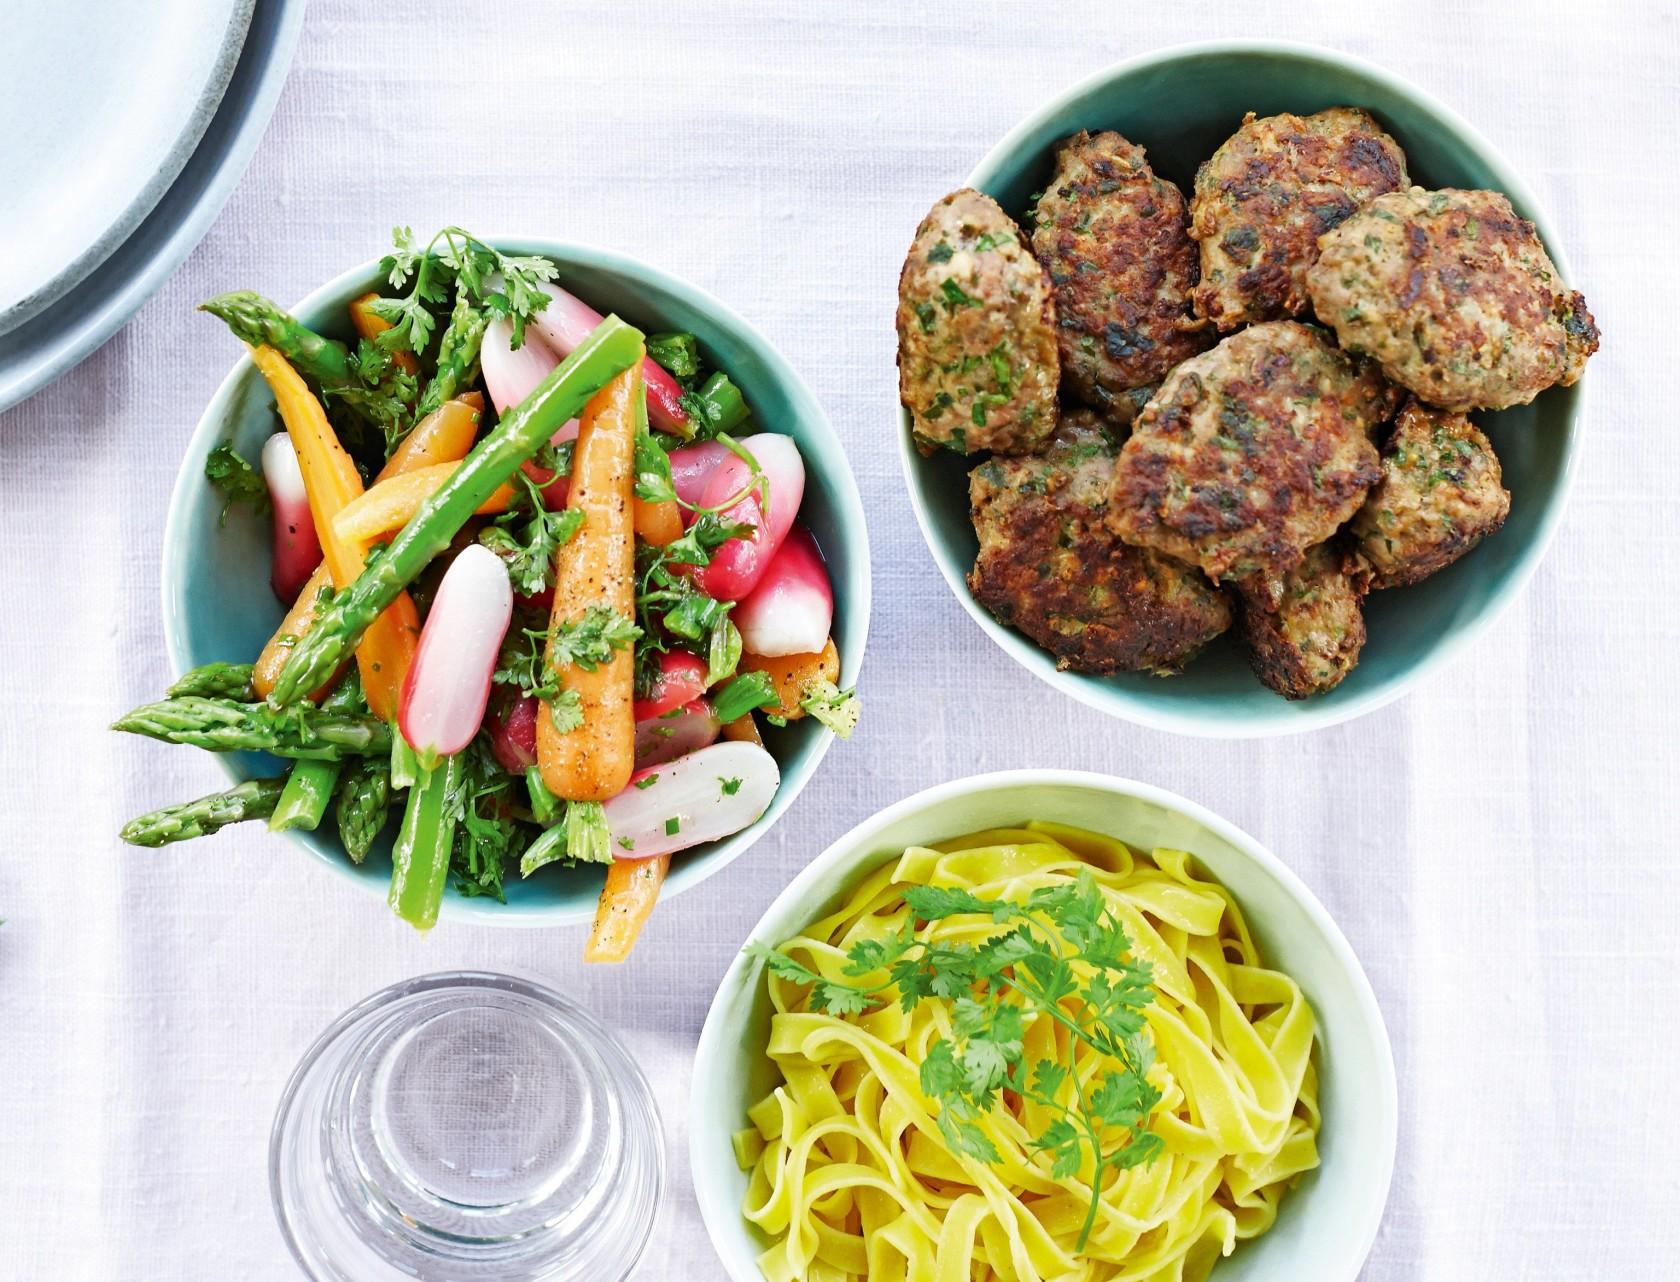 Frikadeller med persille, nye sommergrøntsager og frisk pasta.